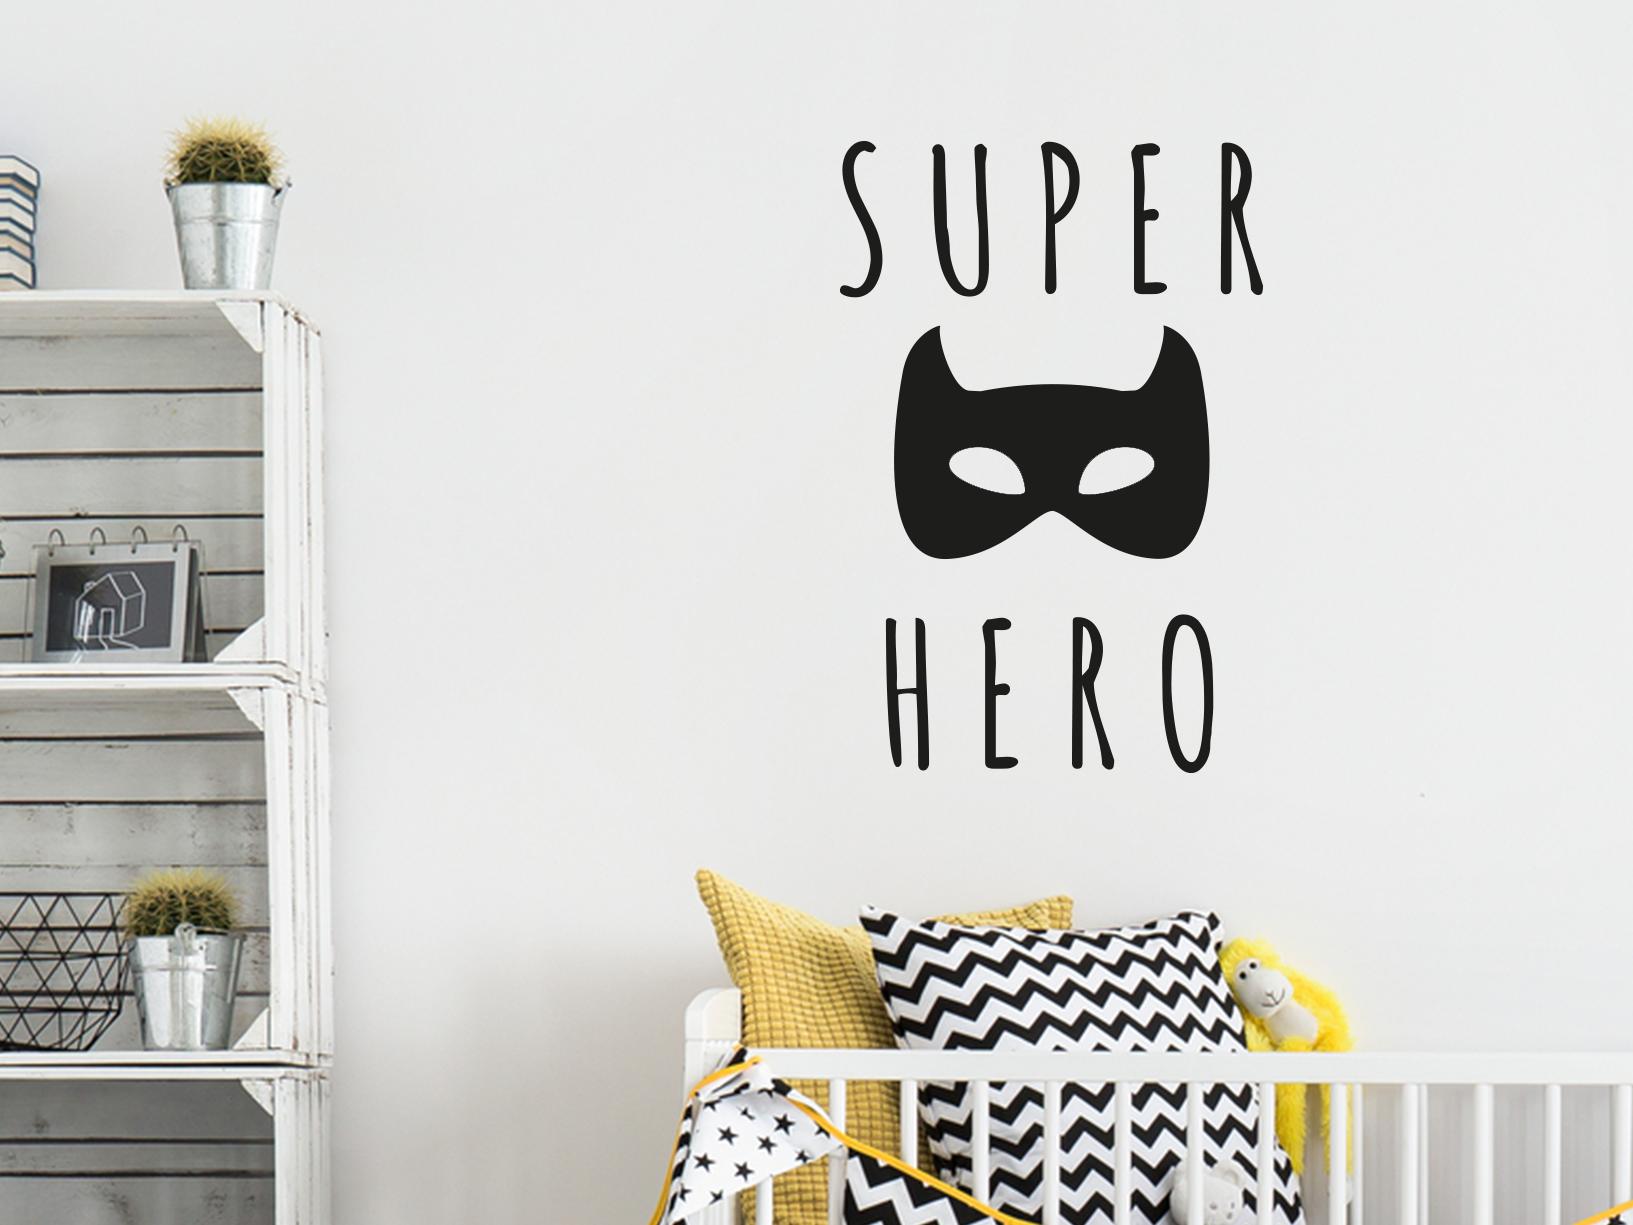 Muurstickers Kinderkamer Belgie.Muursticker Superhero Met Batman Masker Kinderkamer Muurstickers